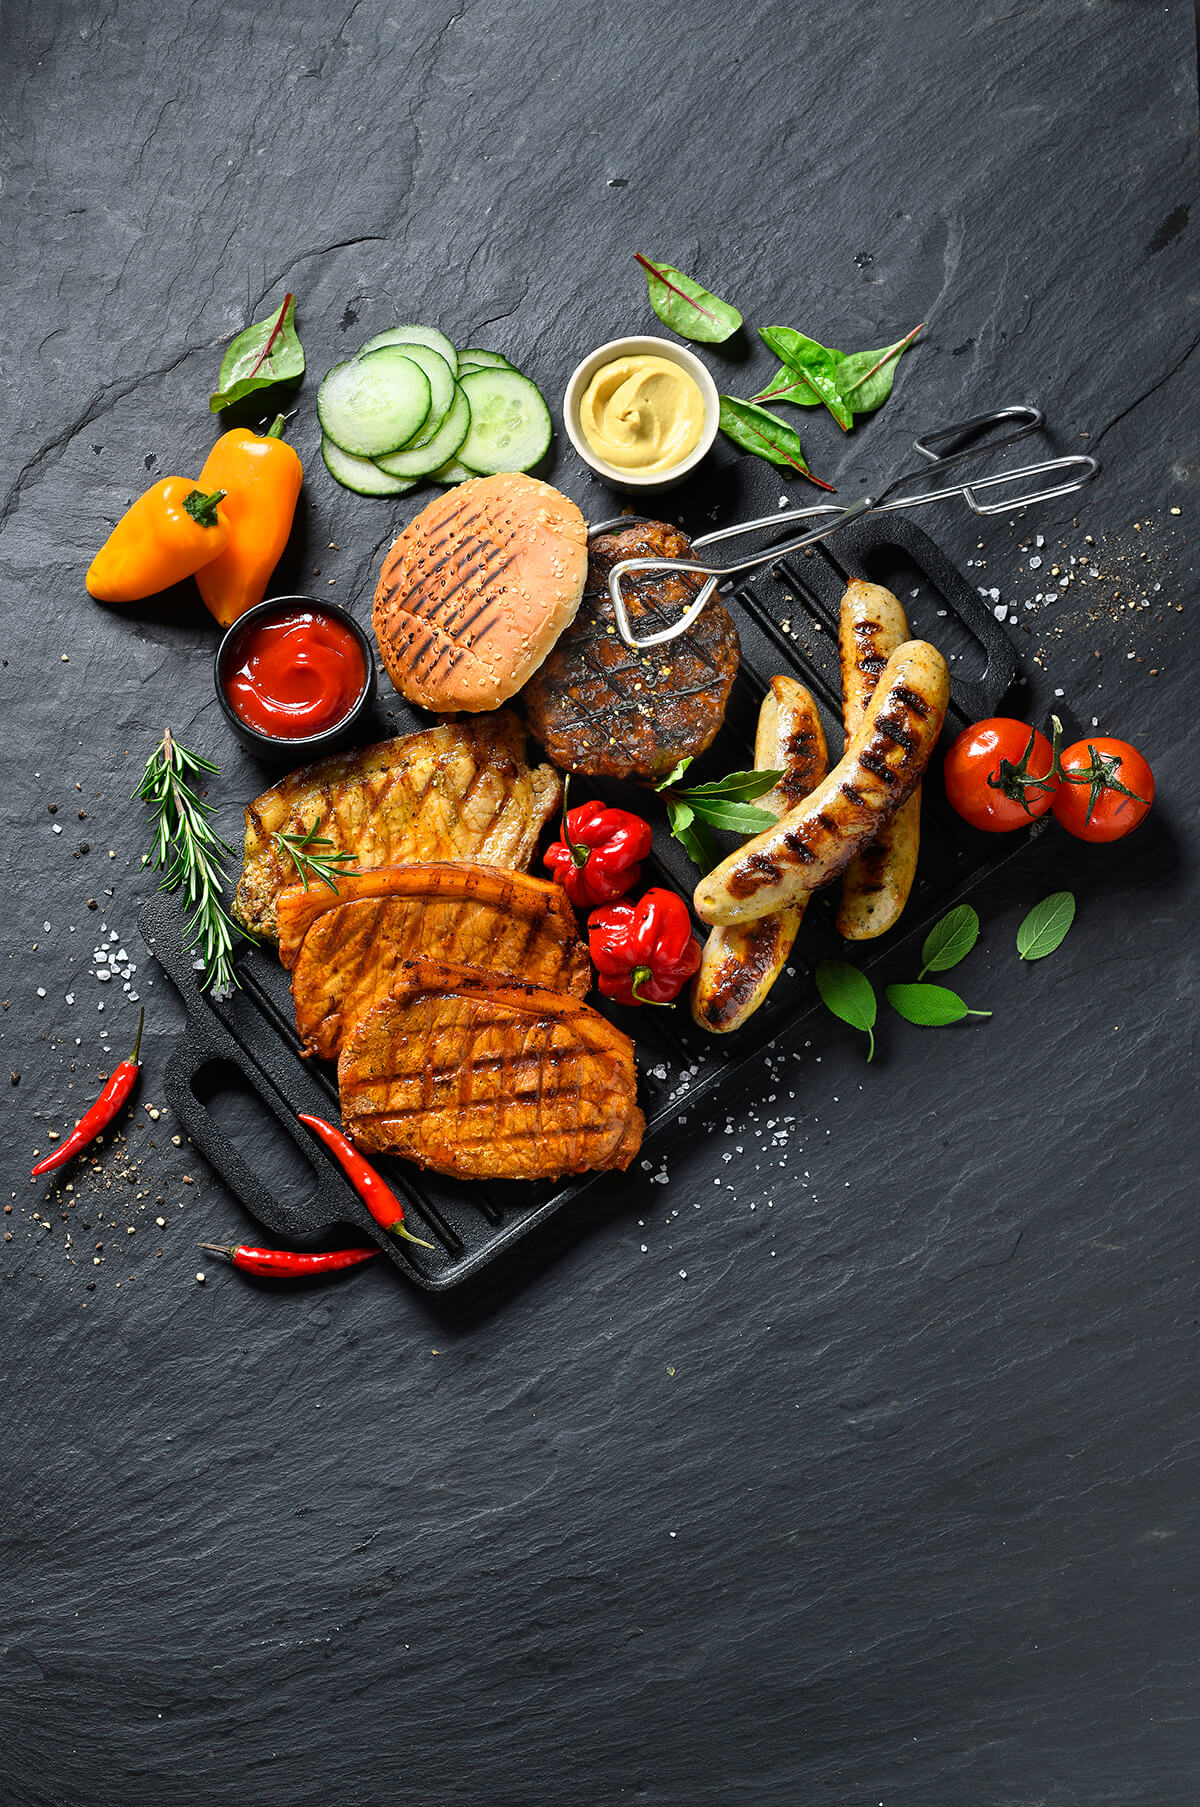 Grillgut von Antje Plewinski Foodfotografie